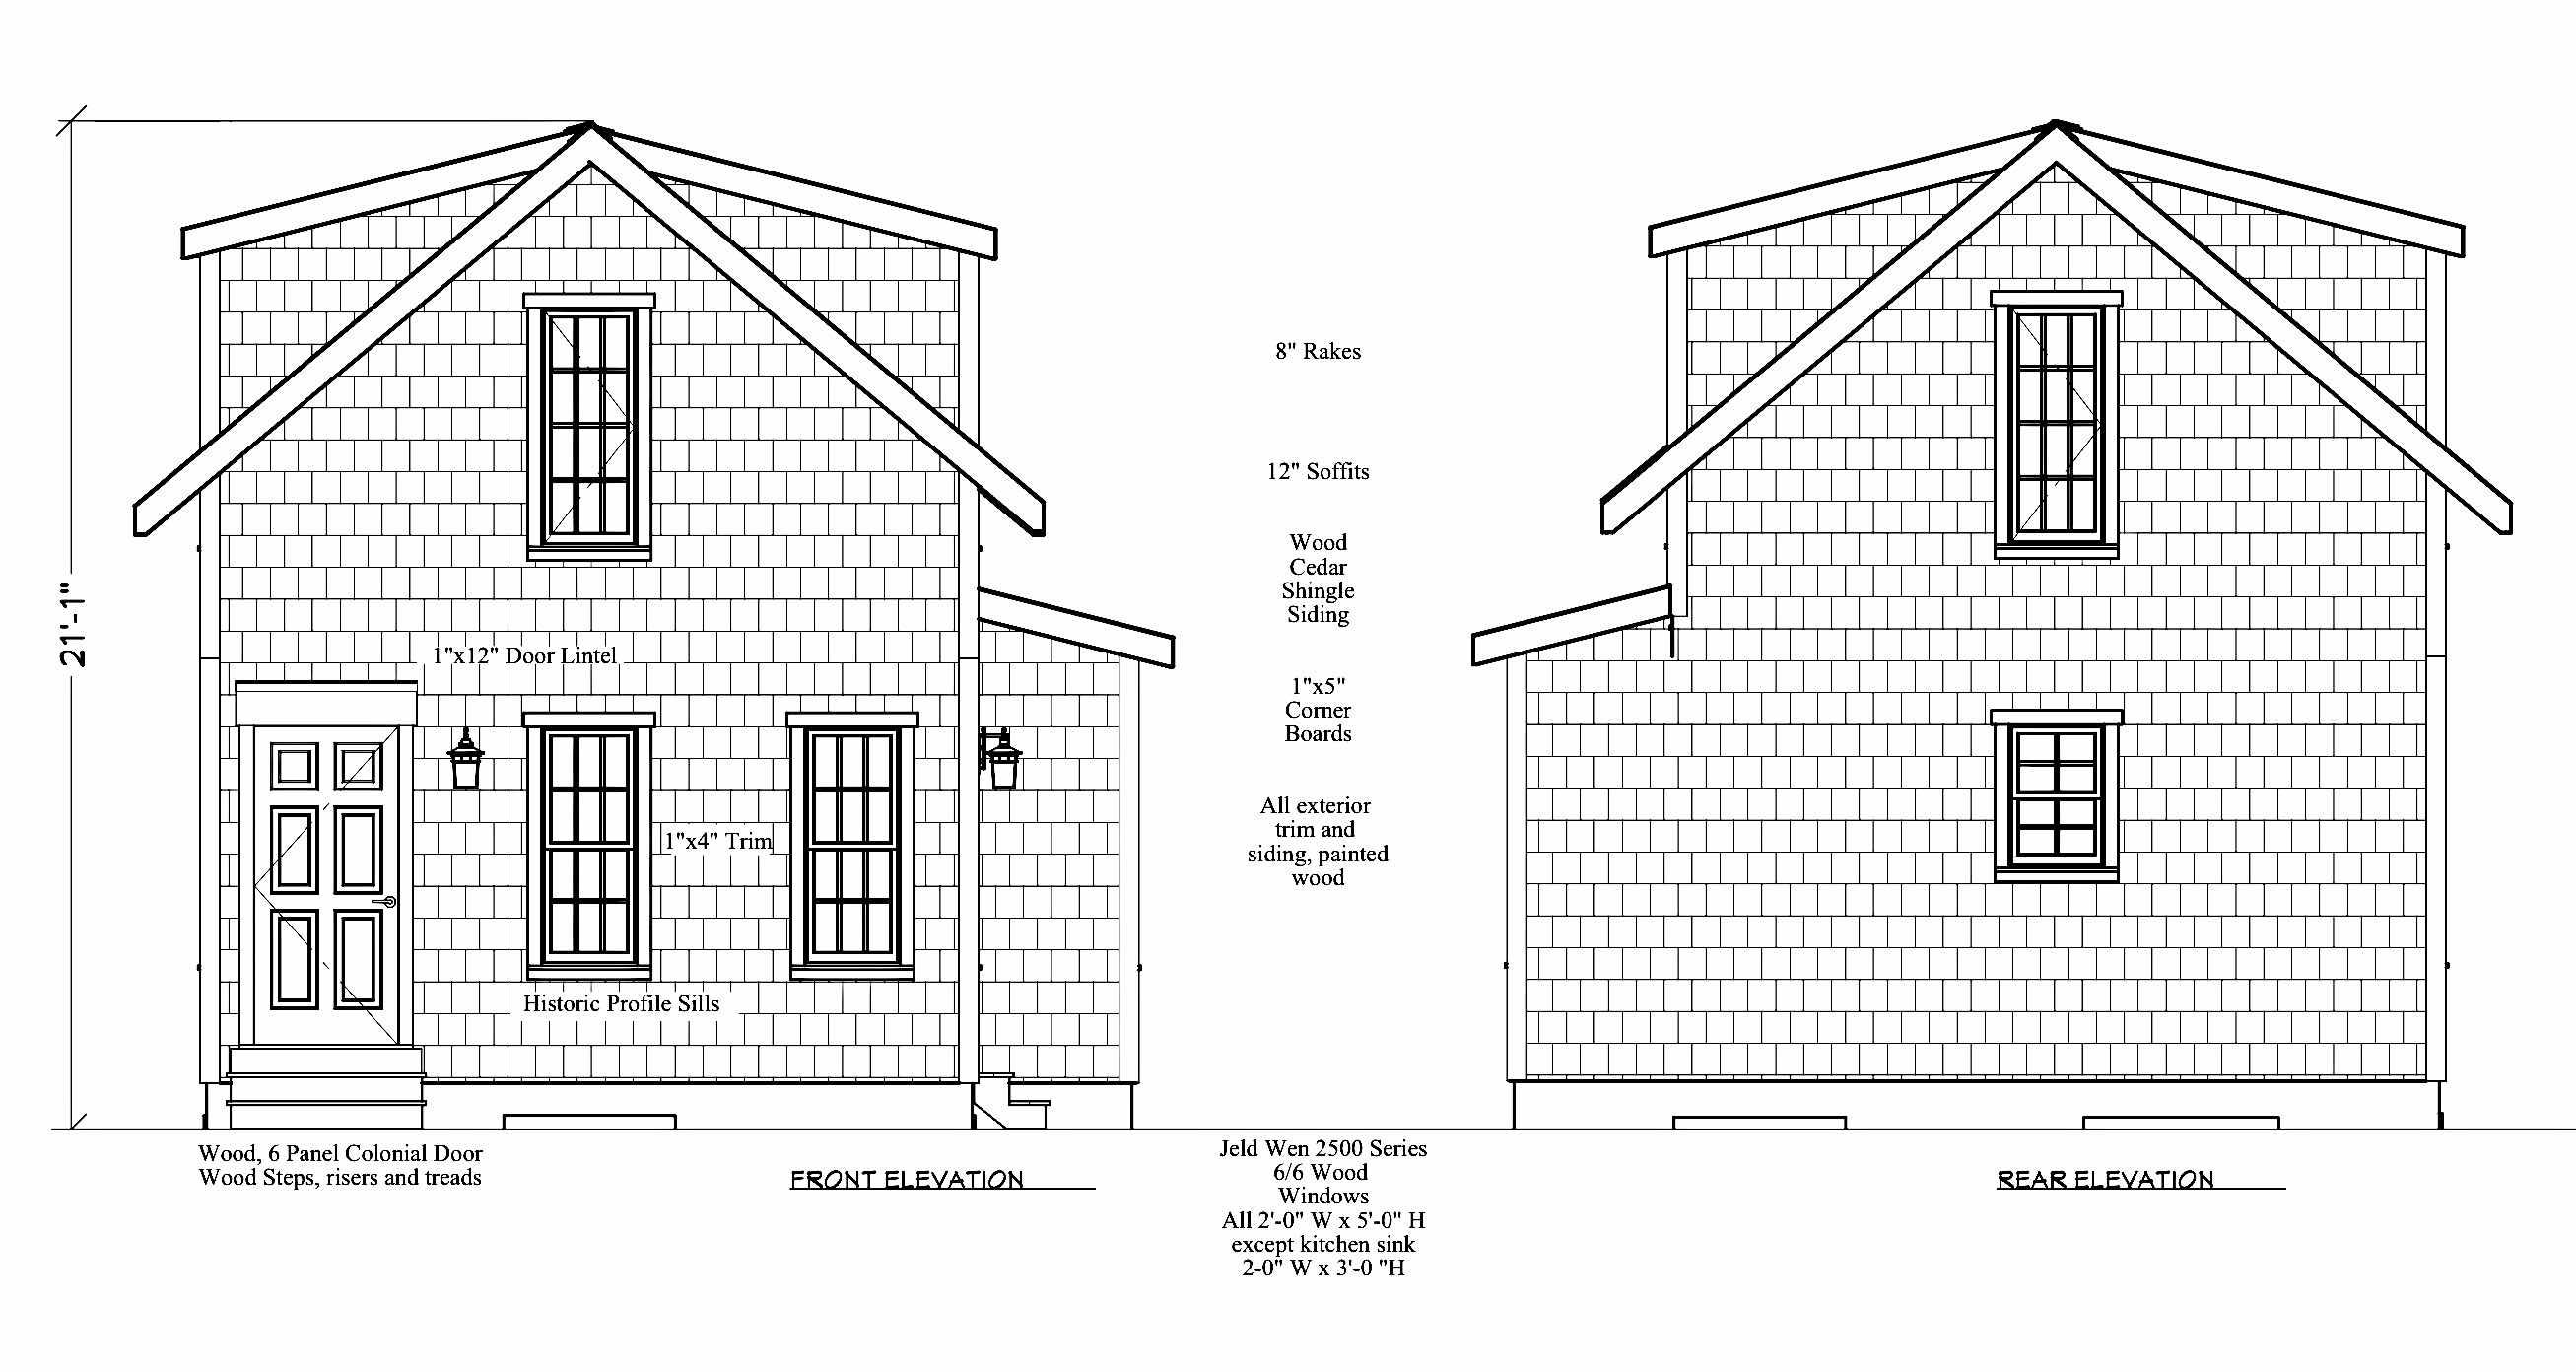 286A Bradford Street, Provincetown MA, 02657 details